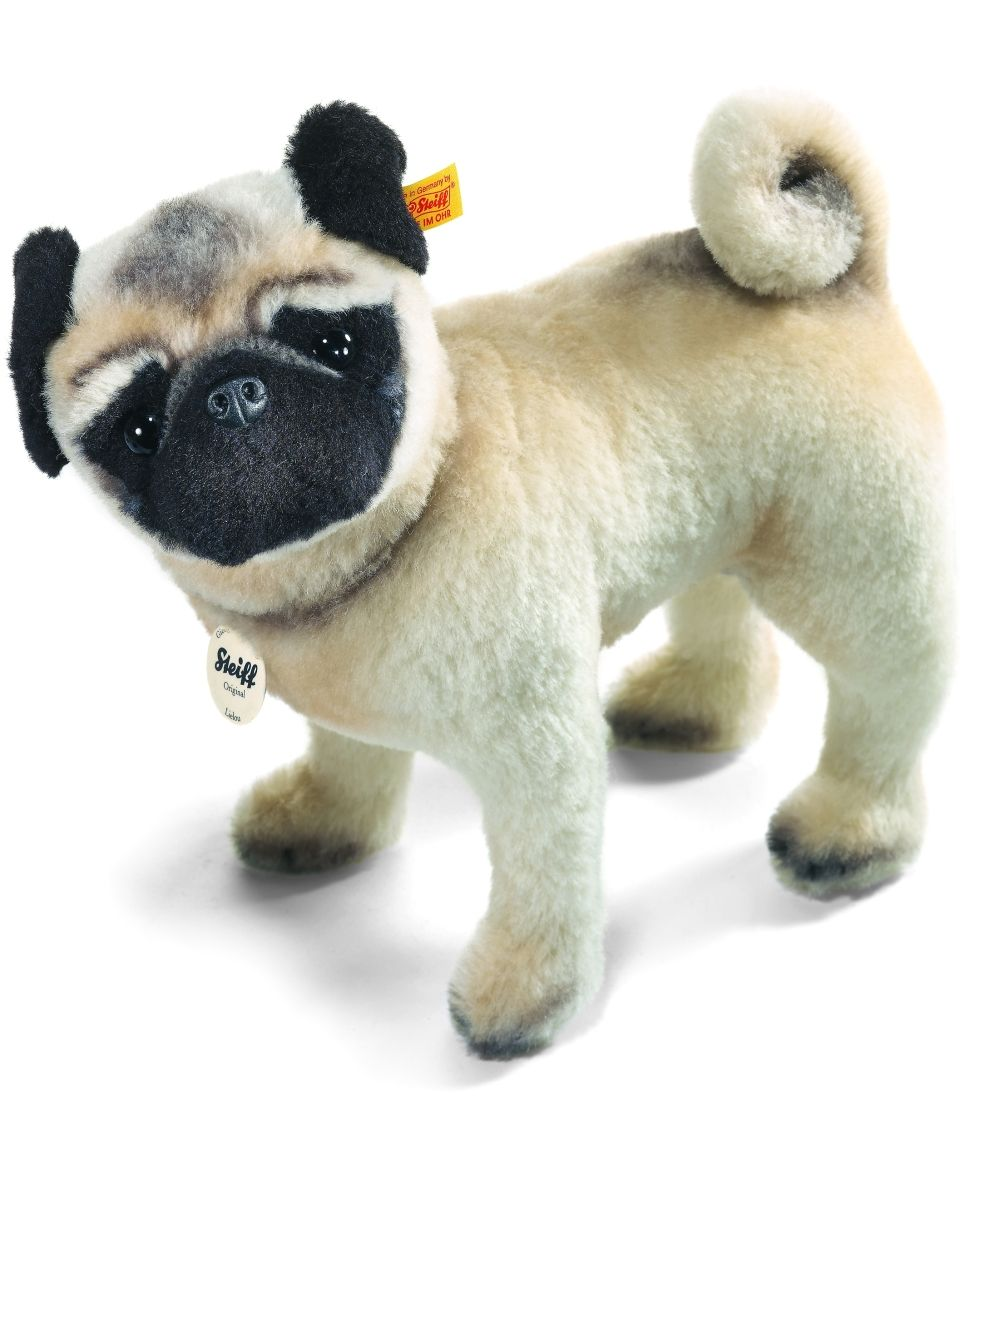 432706dbdfaf04 Lielou Pug Ean 045042 I M Stuffed Pugs Dog Toys Dogs